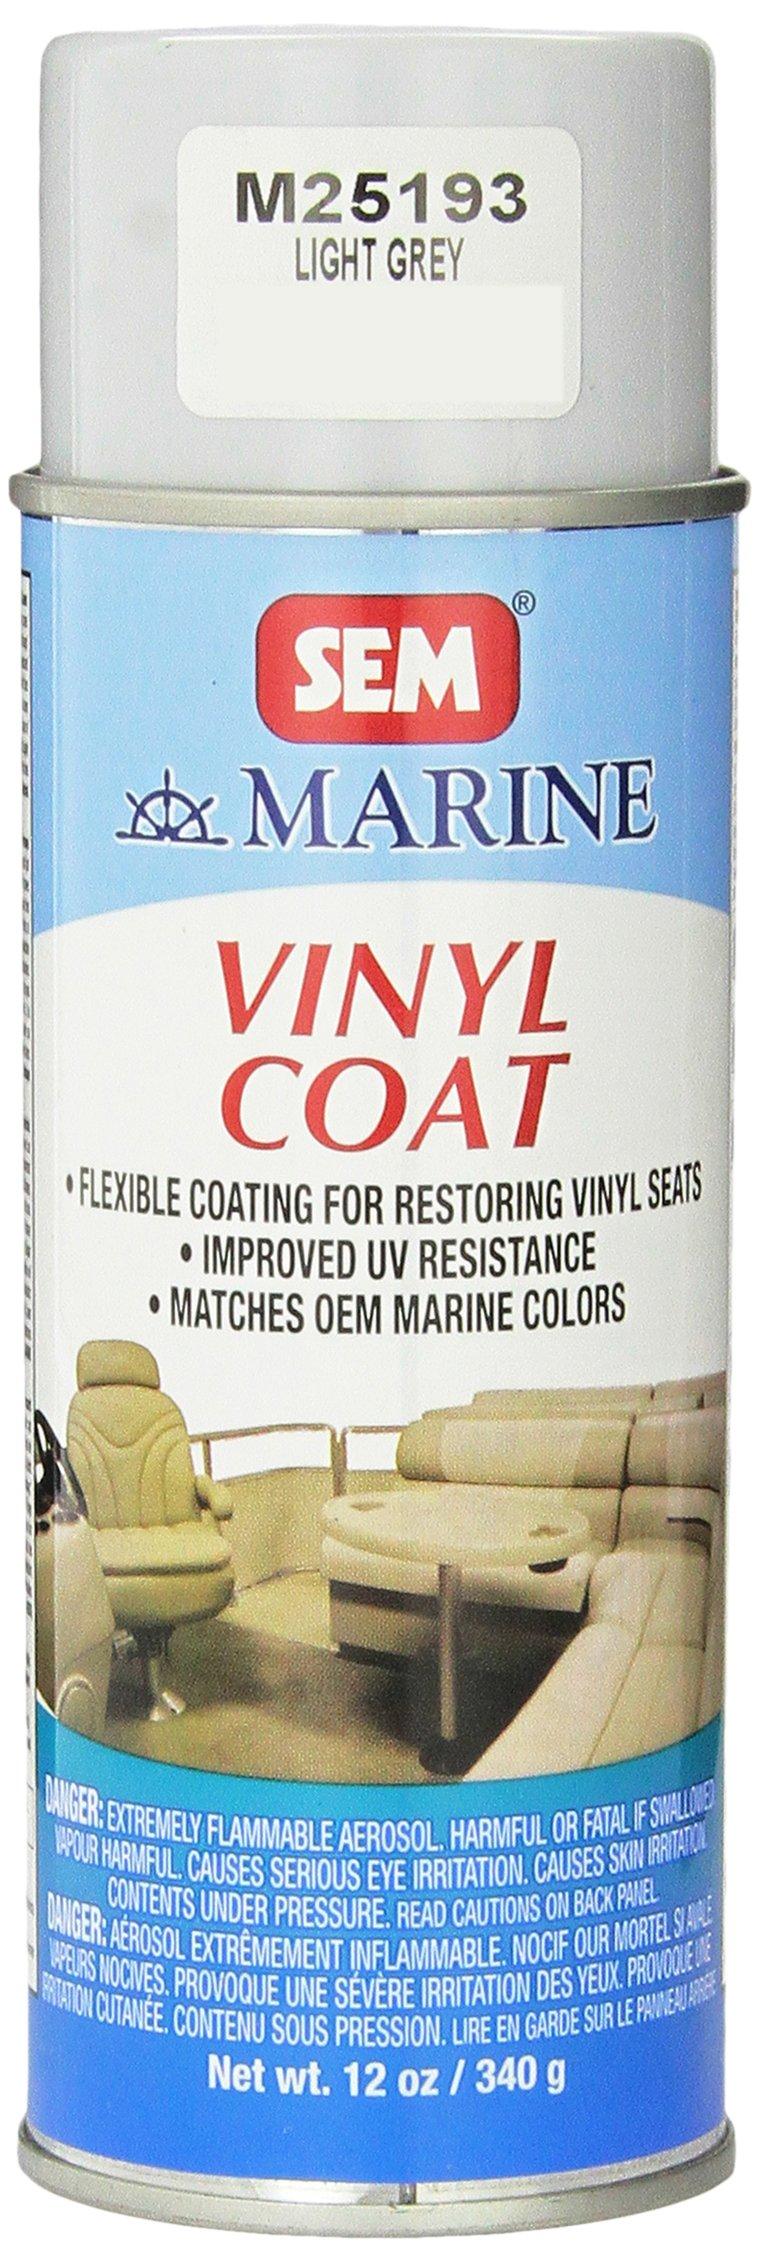 SEM M25193 Light Grey Marine Vinyl Coat - 12 oz.